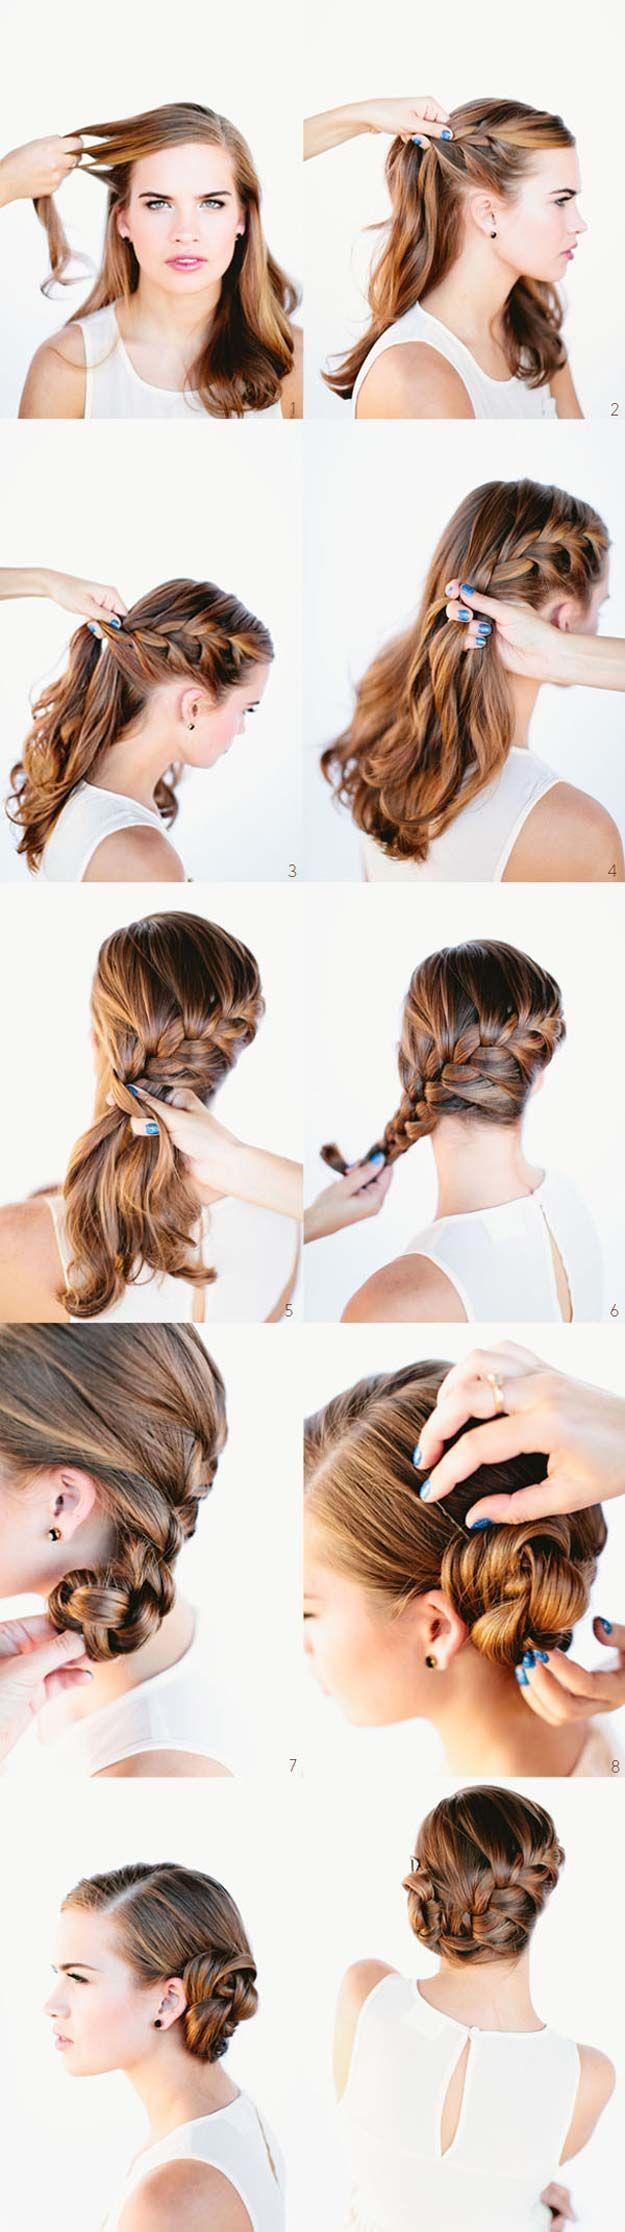 60 Easy Step By Step Hair Tutorials For Long, Medium And Short Hair